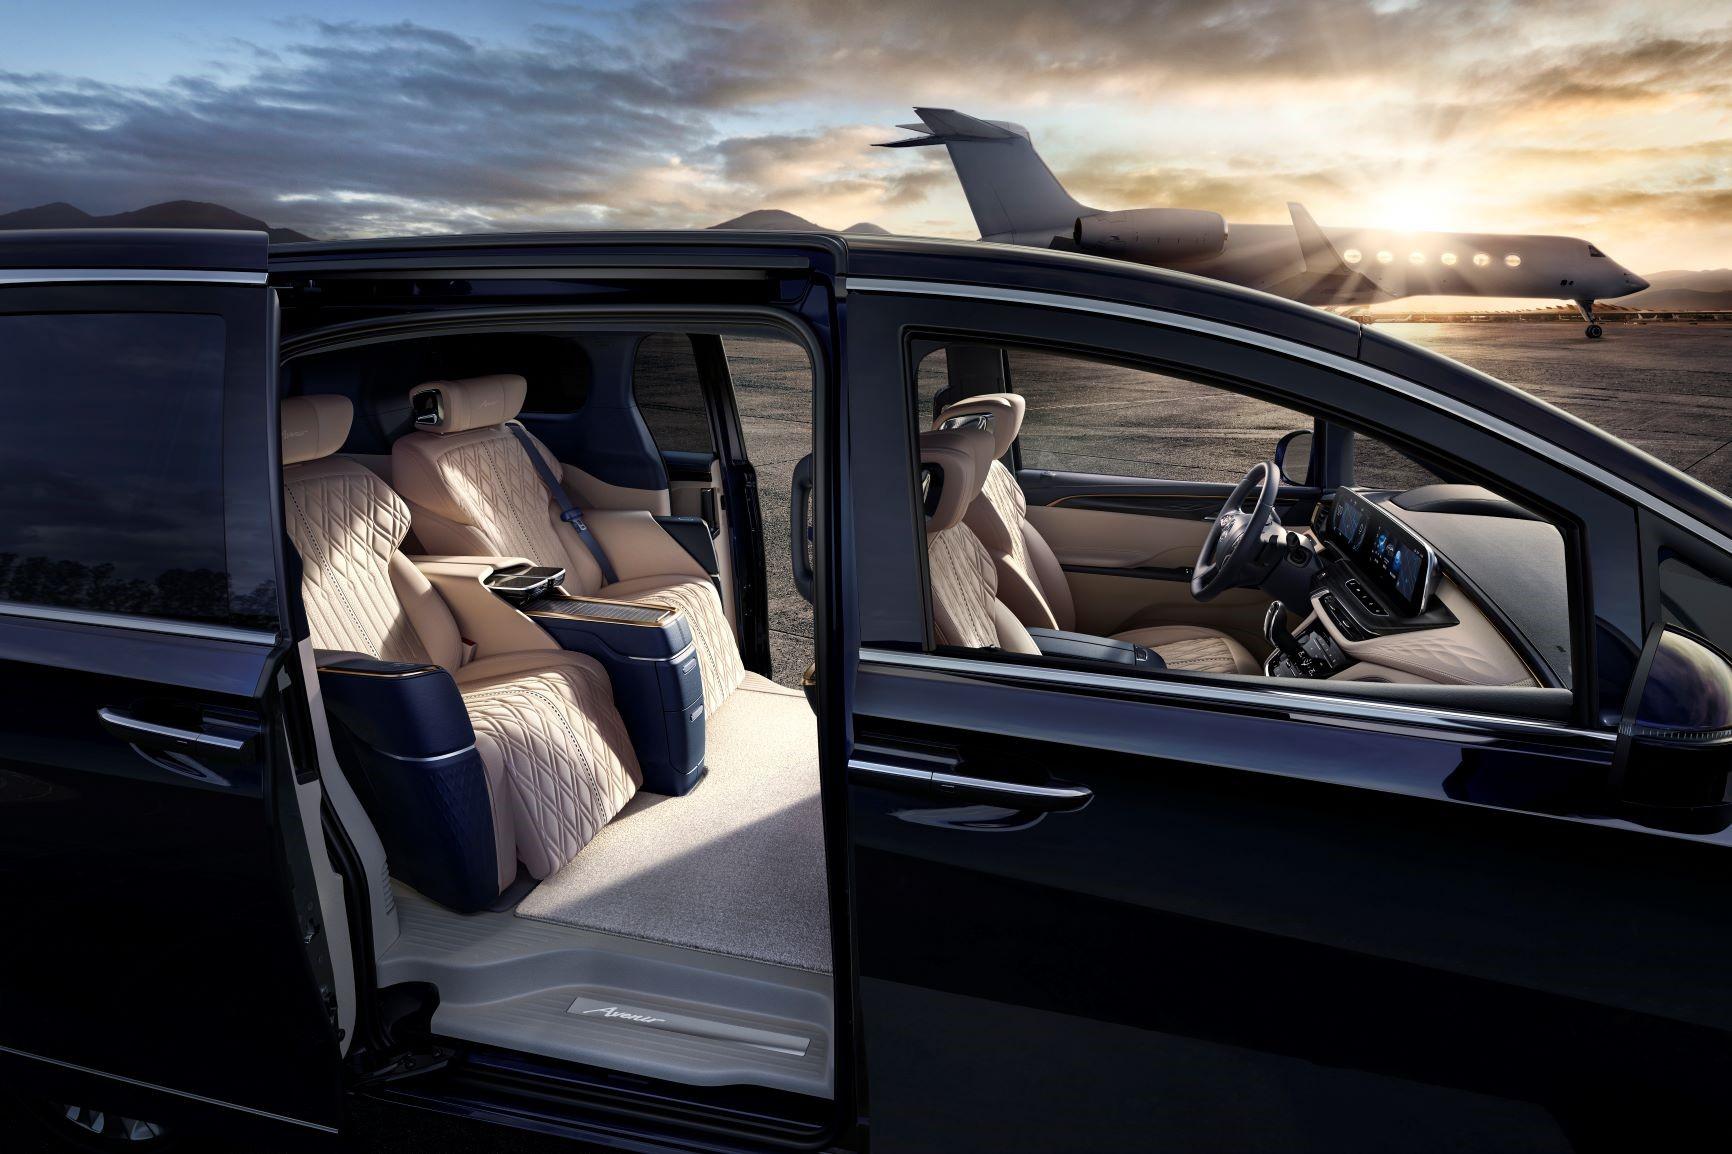 2020-Buick-GL8-Avenir-China-spec-12